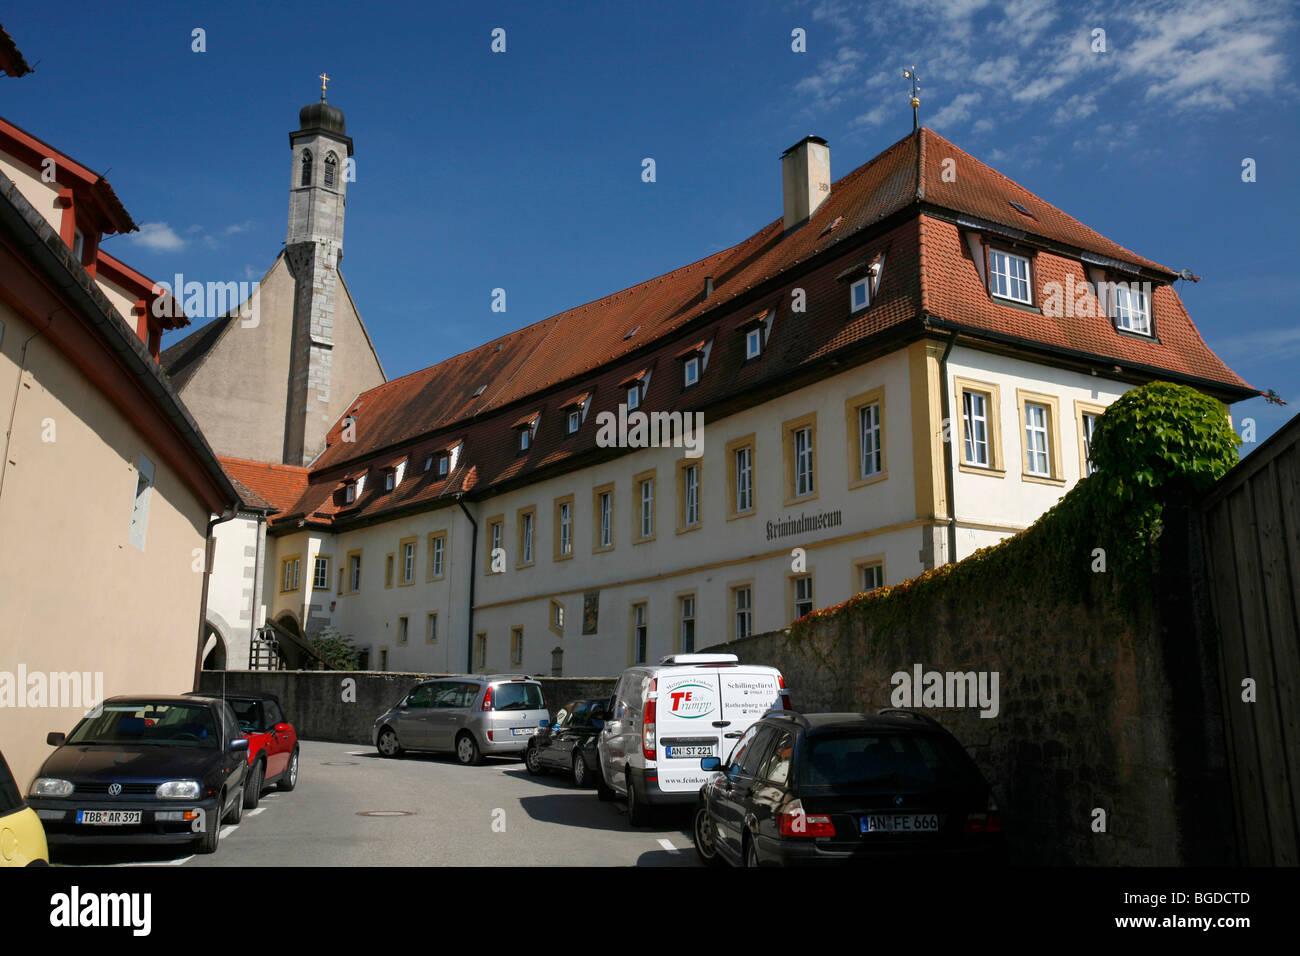 Burggasse lane and Kriminalmuseum crime museum, historic Rothenburg ob der Tauber, Bavaria, Germany, Europe - Stock Image